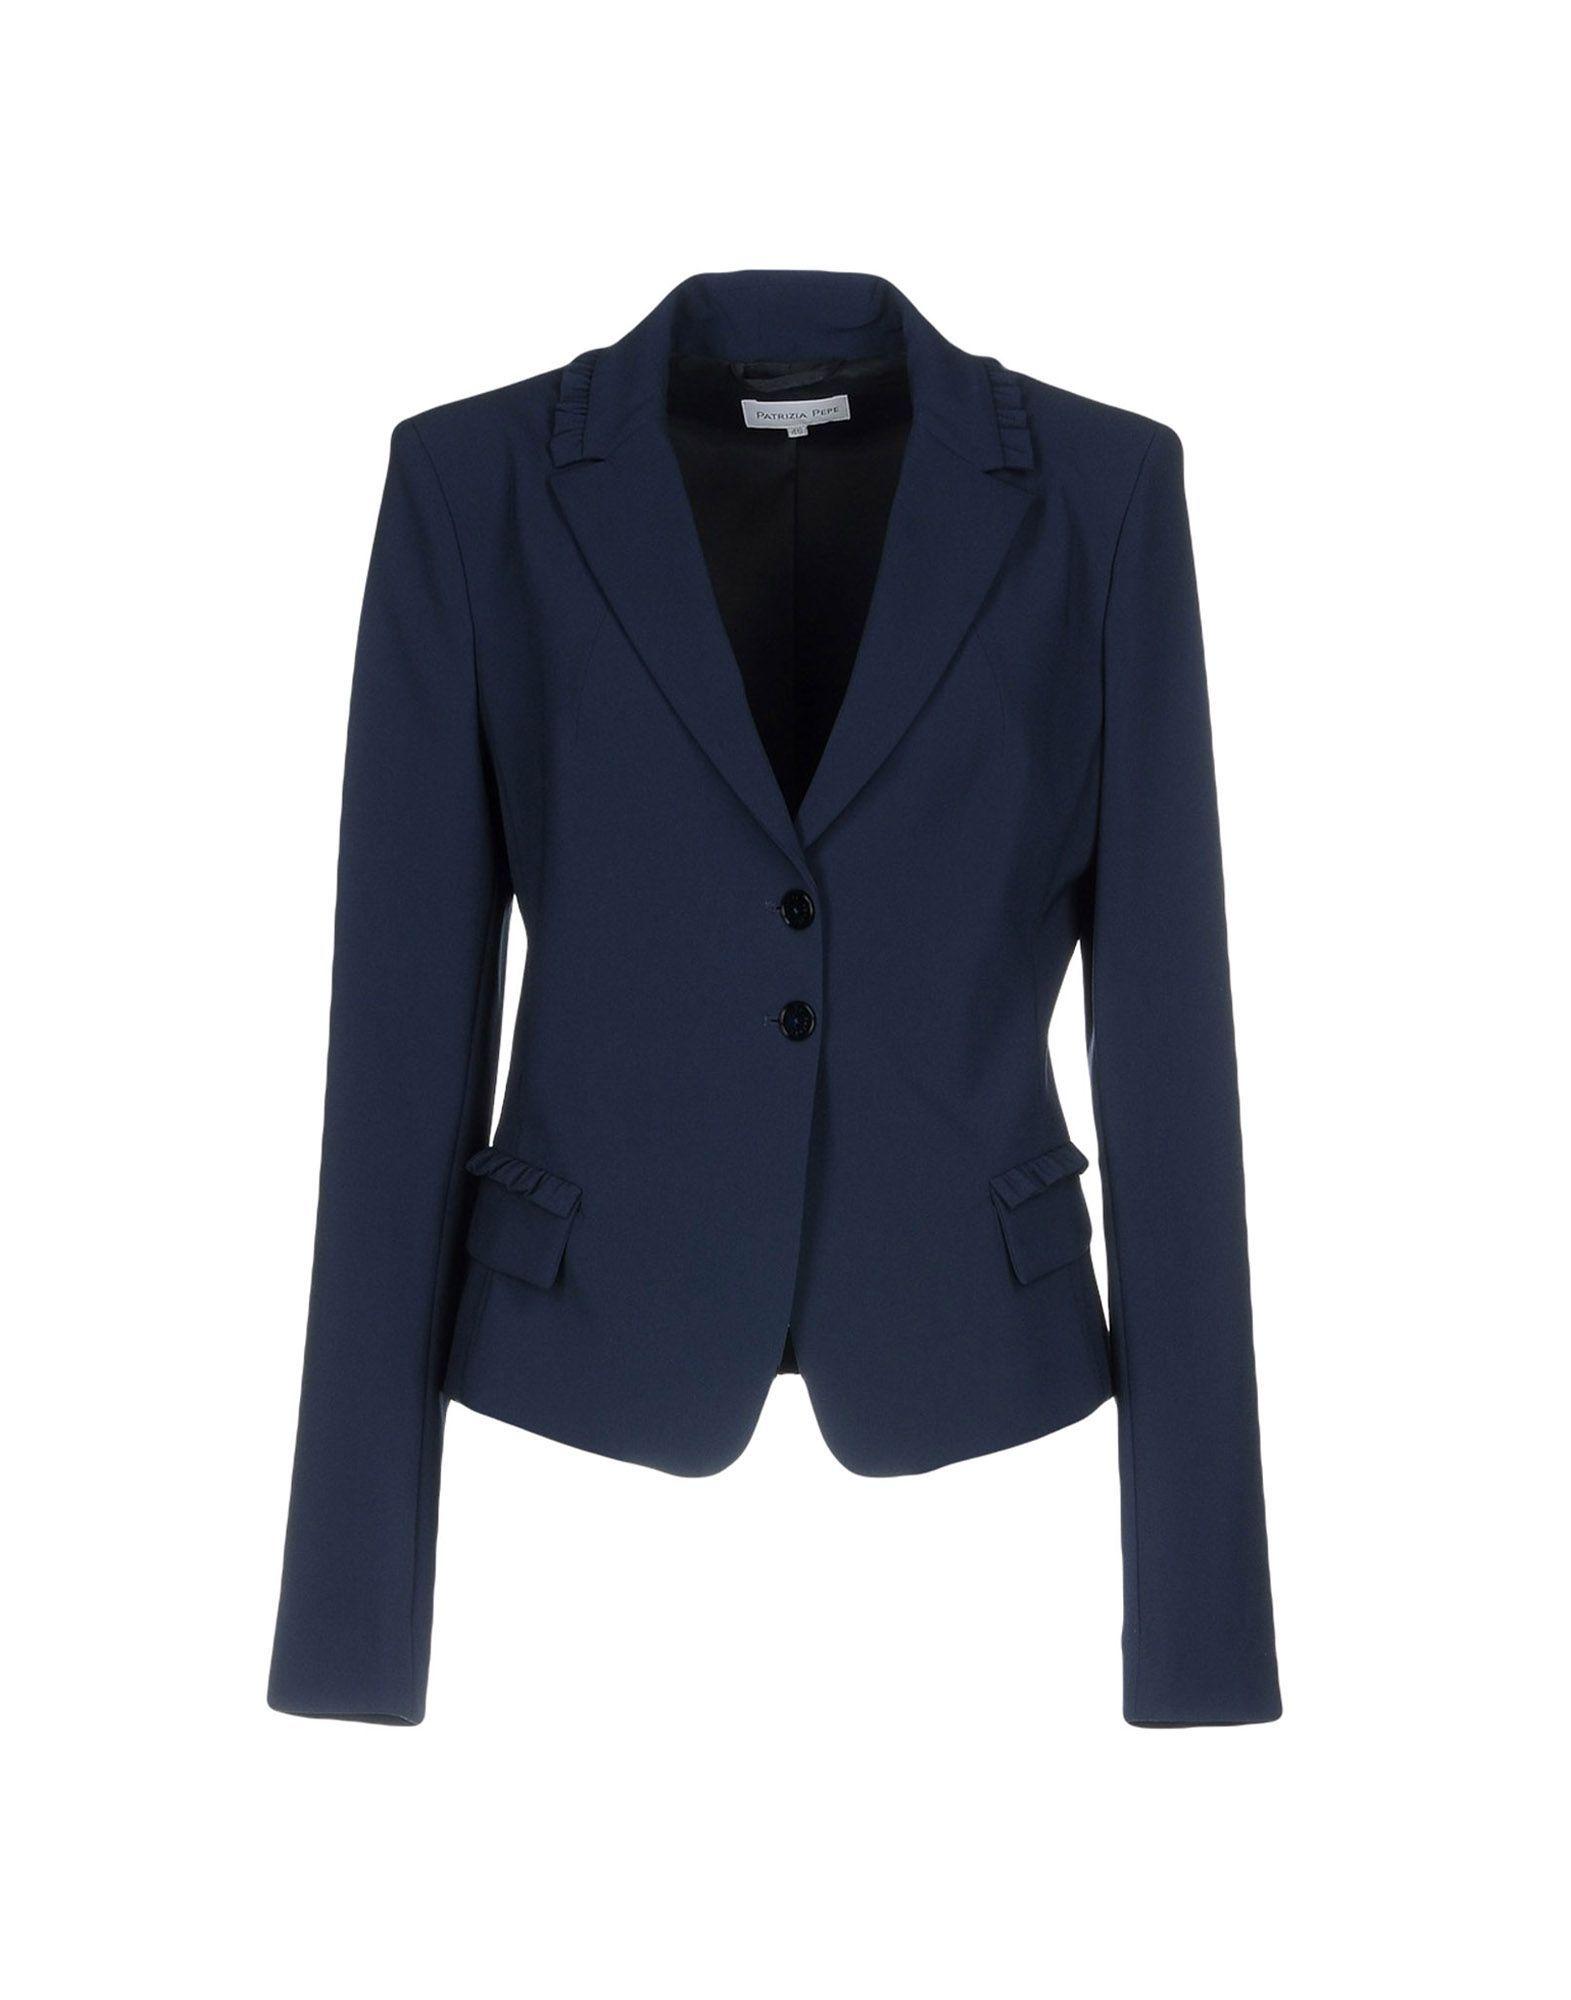 Patrizia Pepe Dark Blue Crepe Single Breasted Blazer